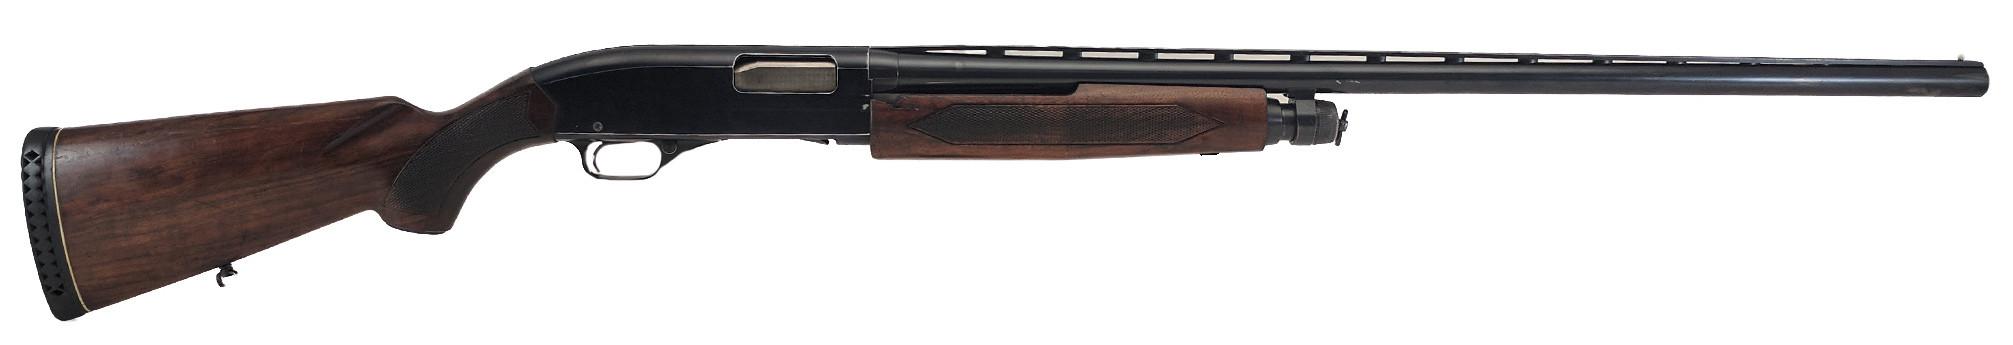 "Winchester 1200, 12GA, 30"" Barrel, *Good, Cracked Stock*"